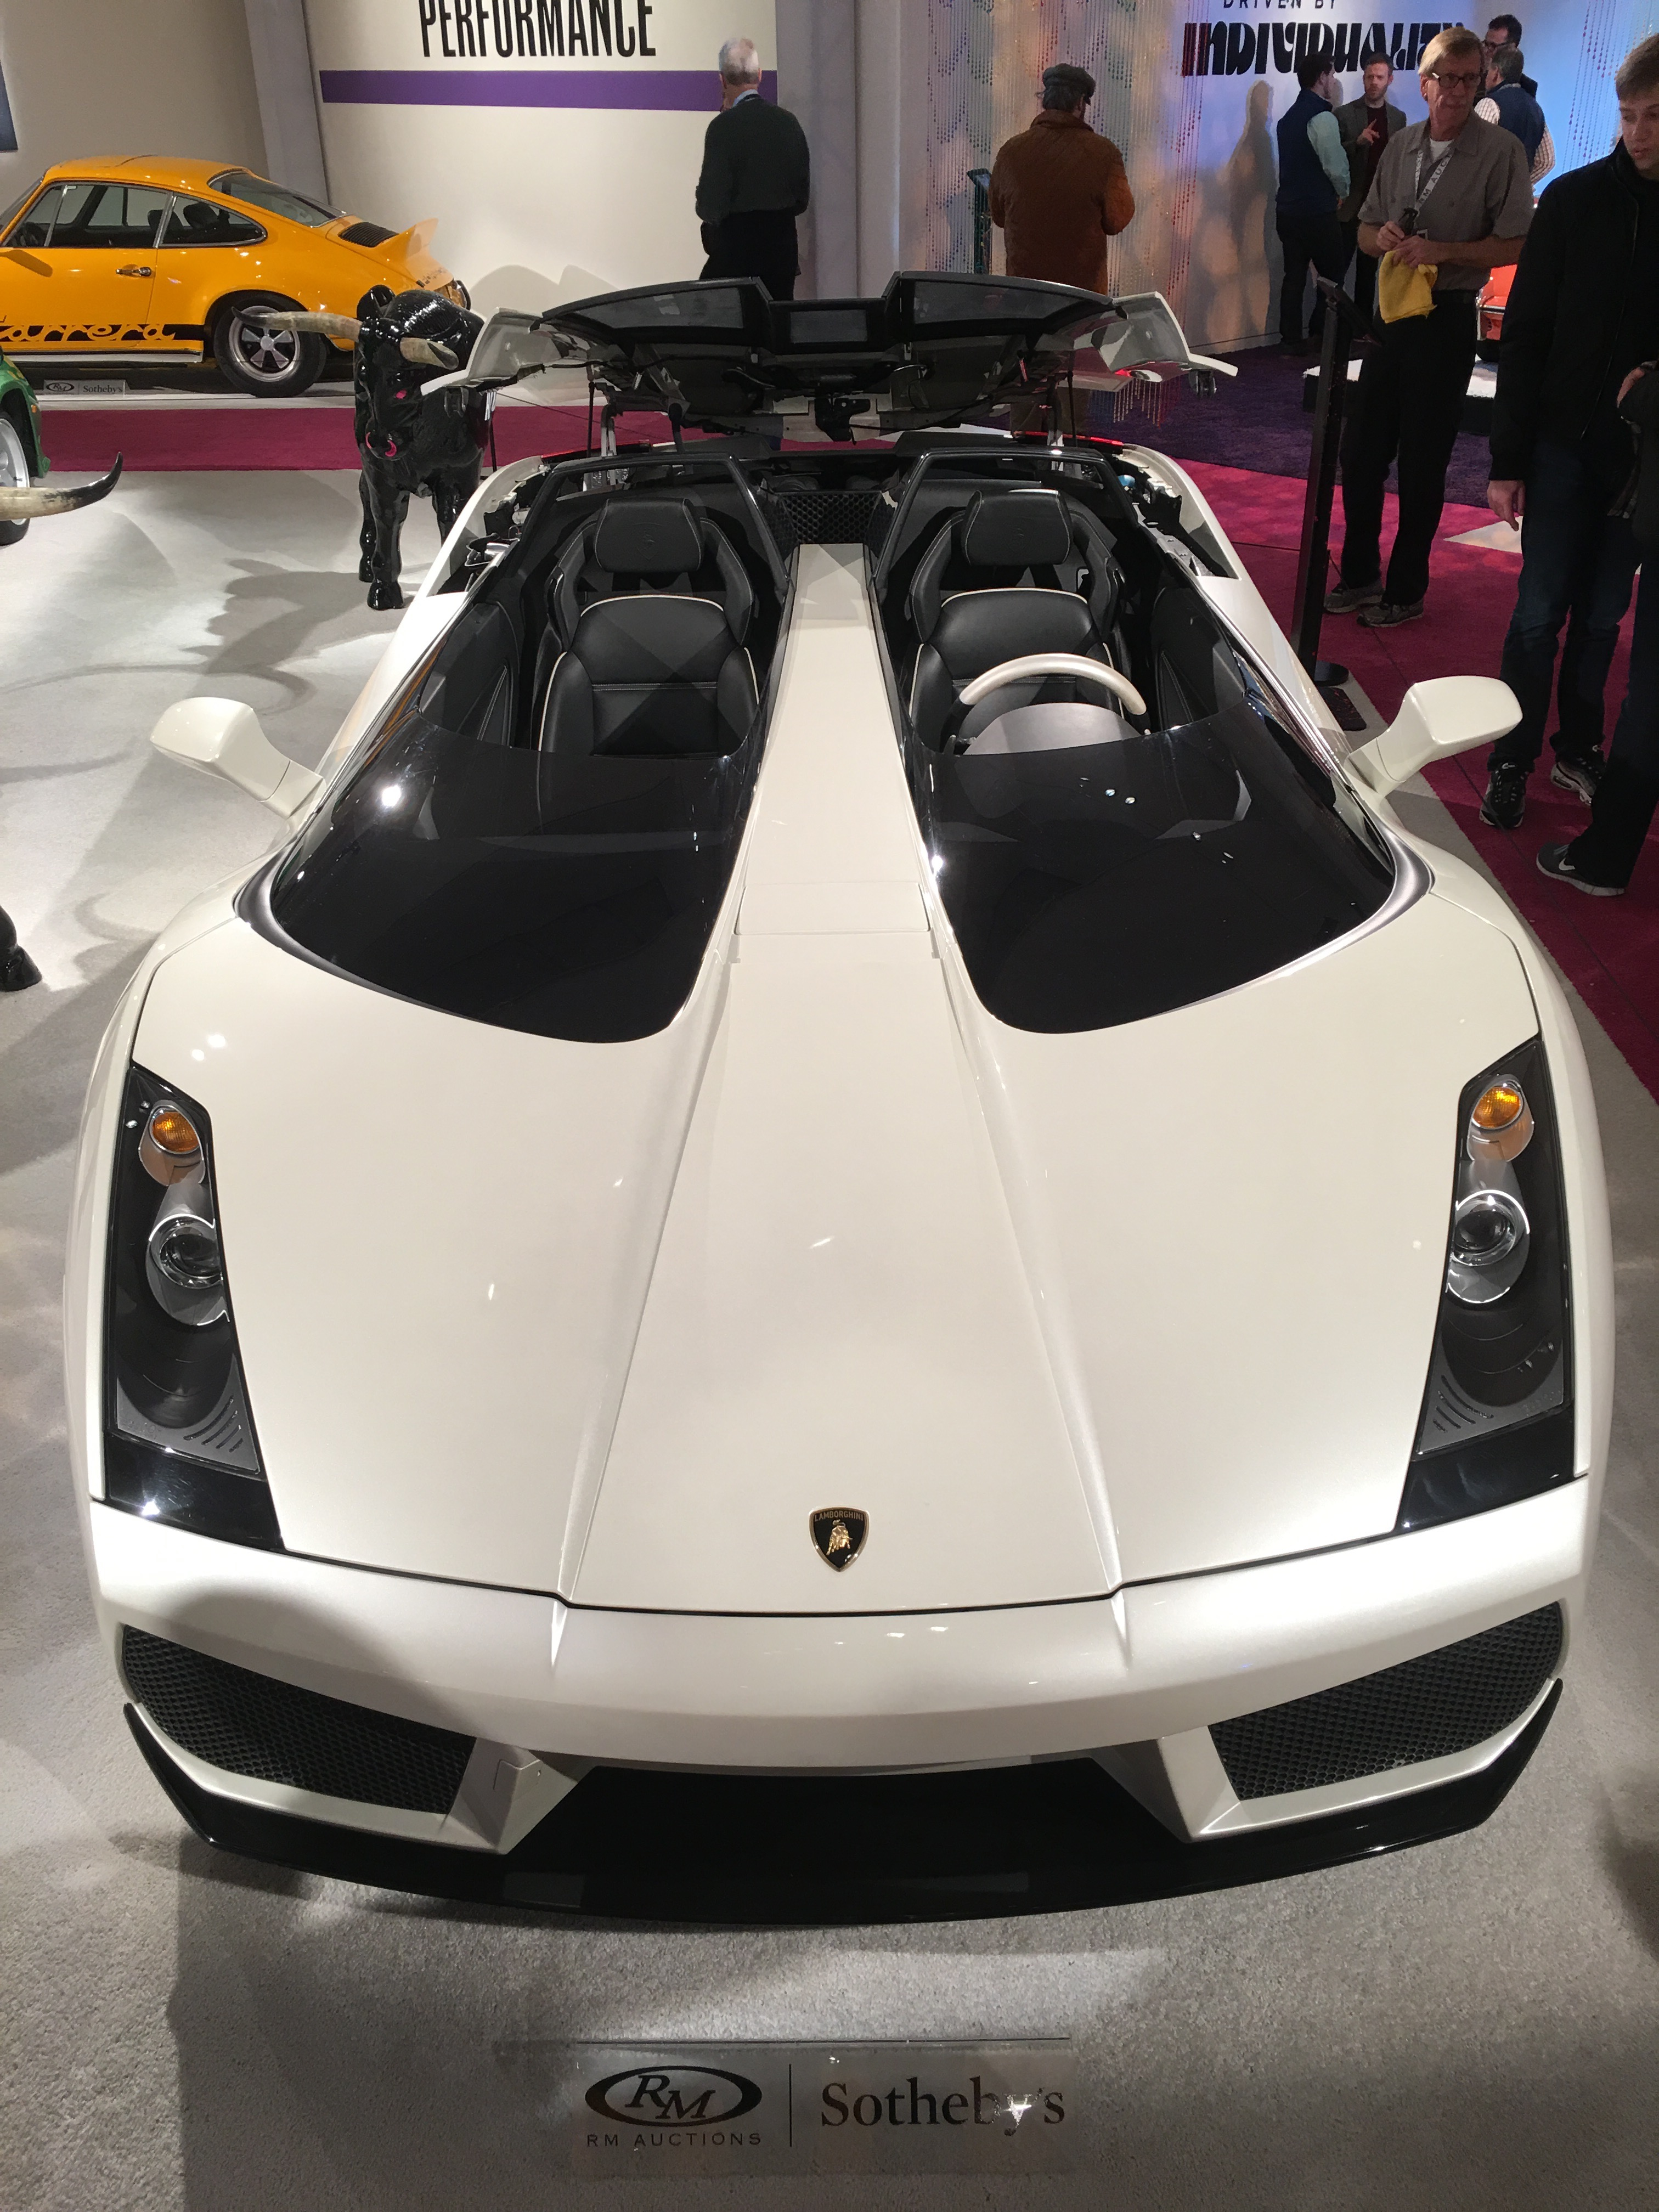 2006 Lamborghini Concept S International Car Shipping